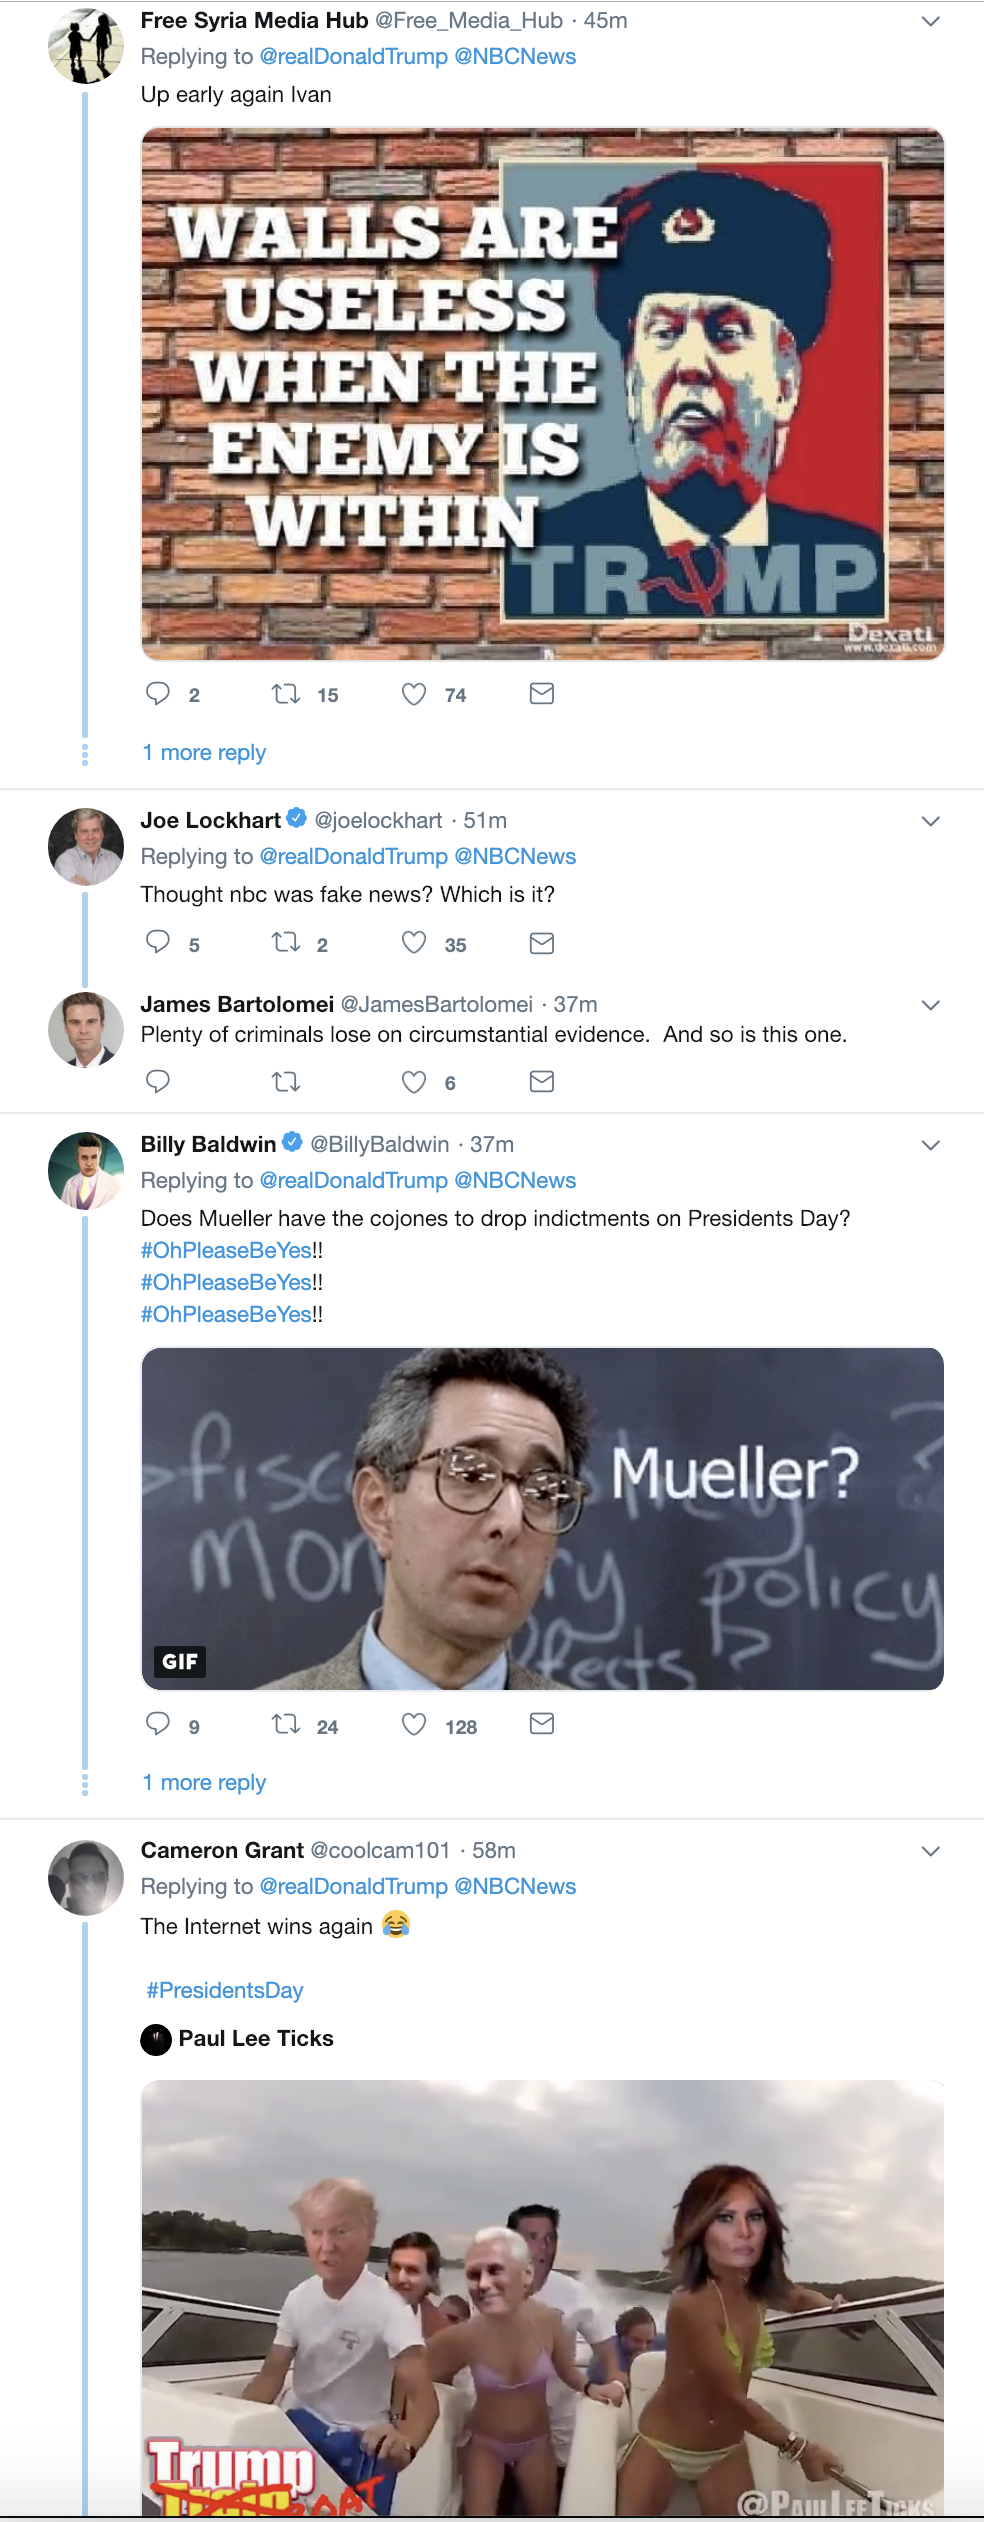 Screen-Shot-2019-02-18-at-6.58.29-AM.png?zoom=2 Trump Erupts Into Multi-Tweet Emotional Breakdown Corruption Crime Donald Trump Media Mueller Politics Robert Mueller Russia Top Stories